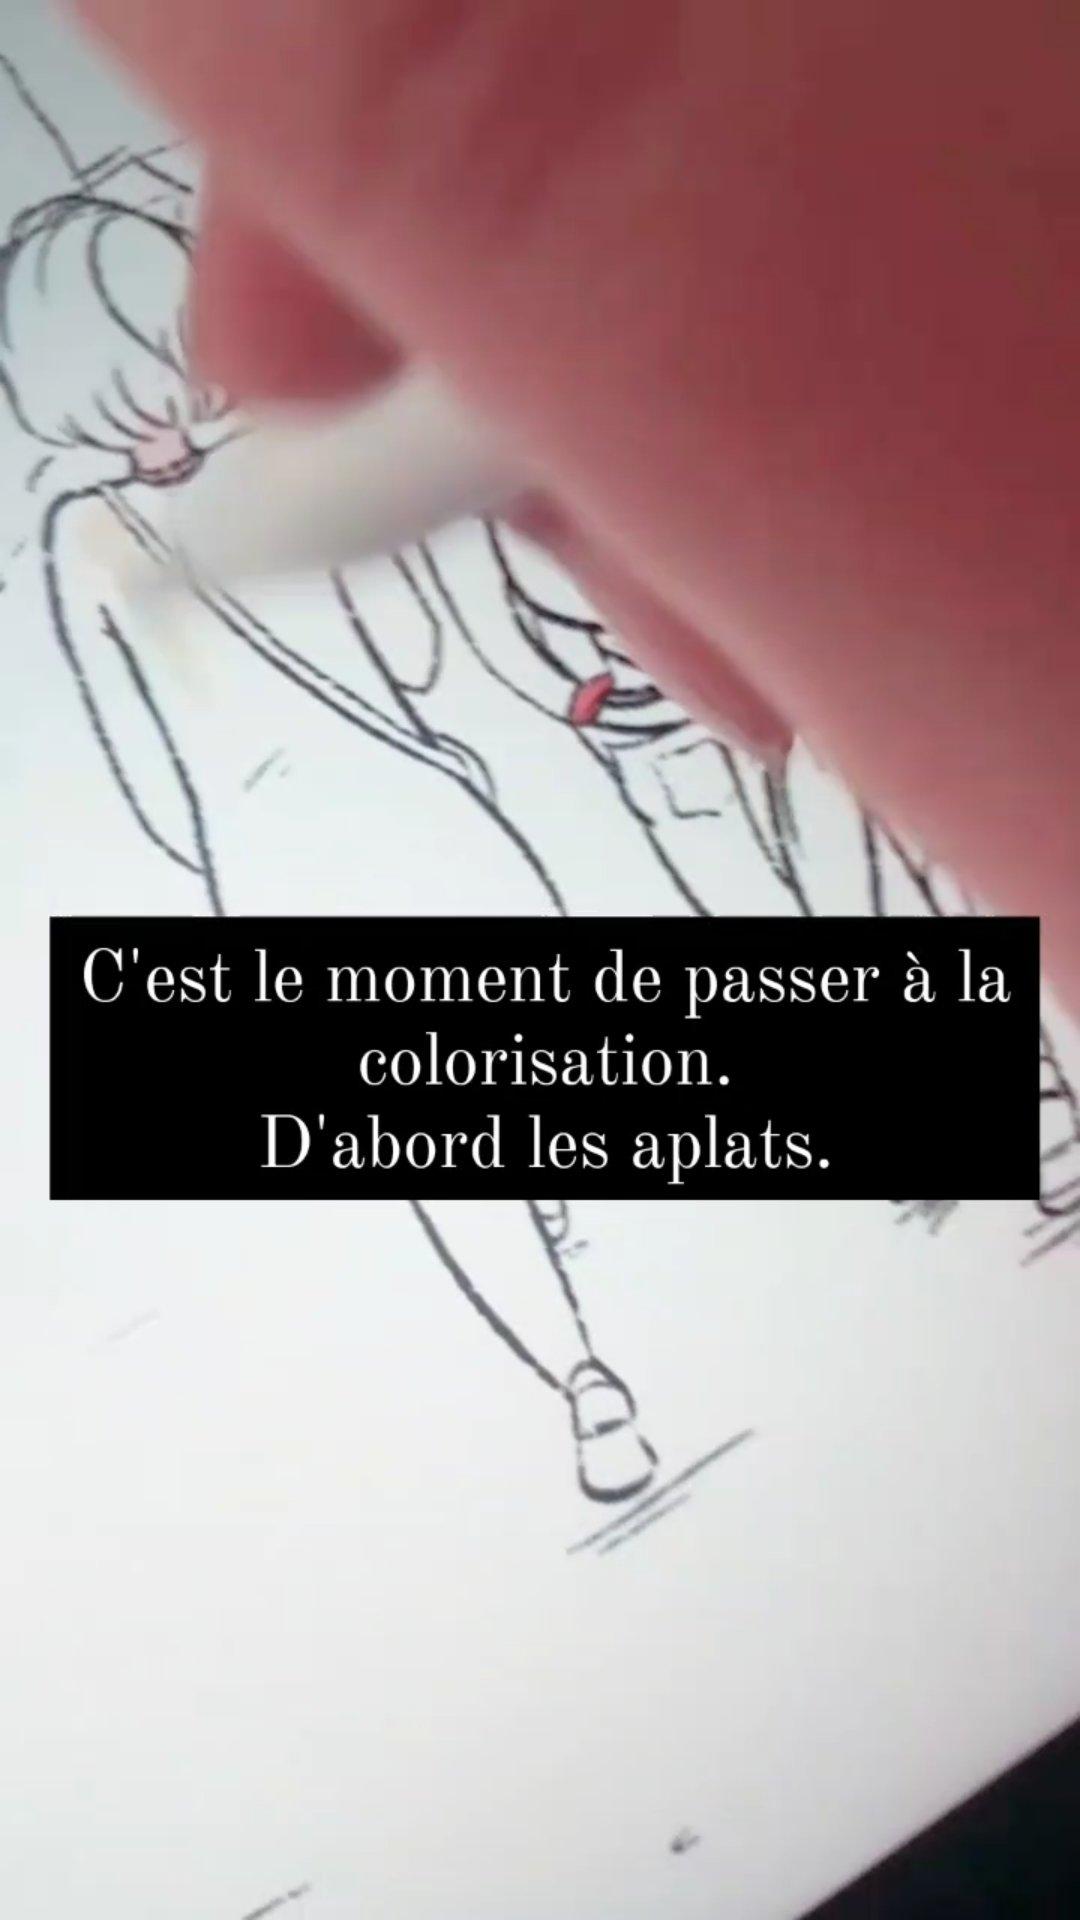 coloriage colorisation coloriste bd bande dessinée dessin illustration